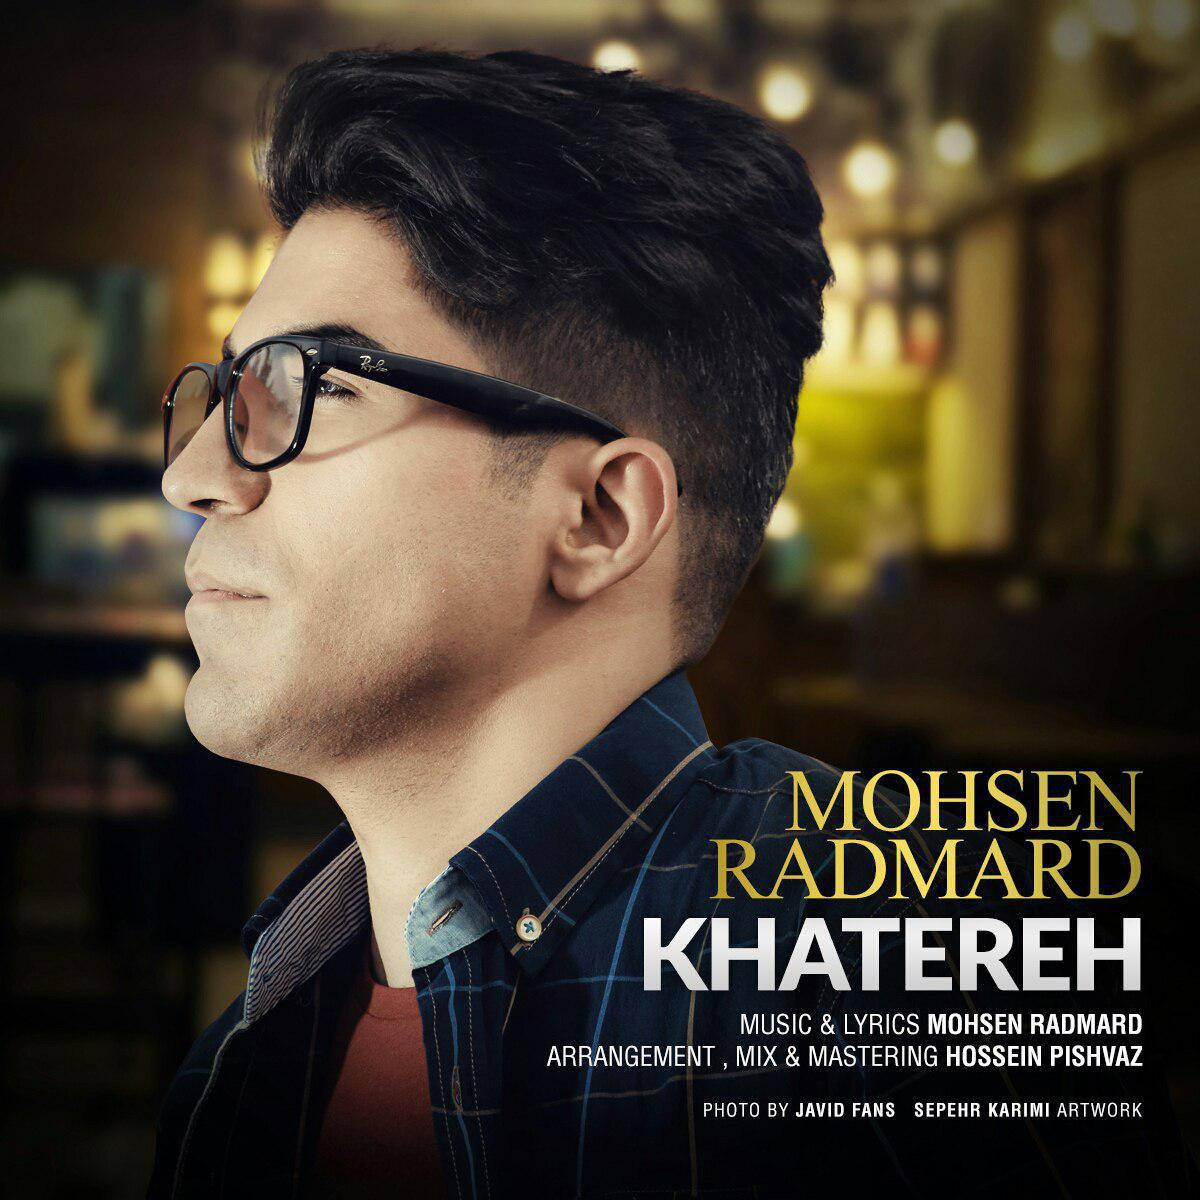 Mohsen Radmard – Khatereh